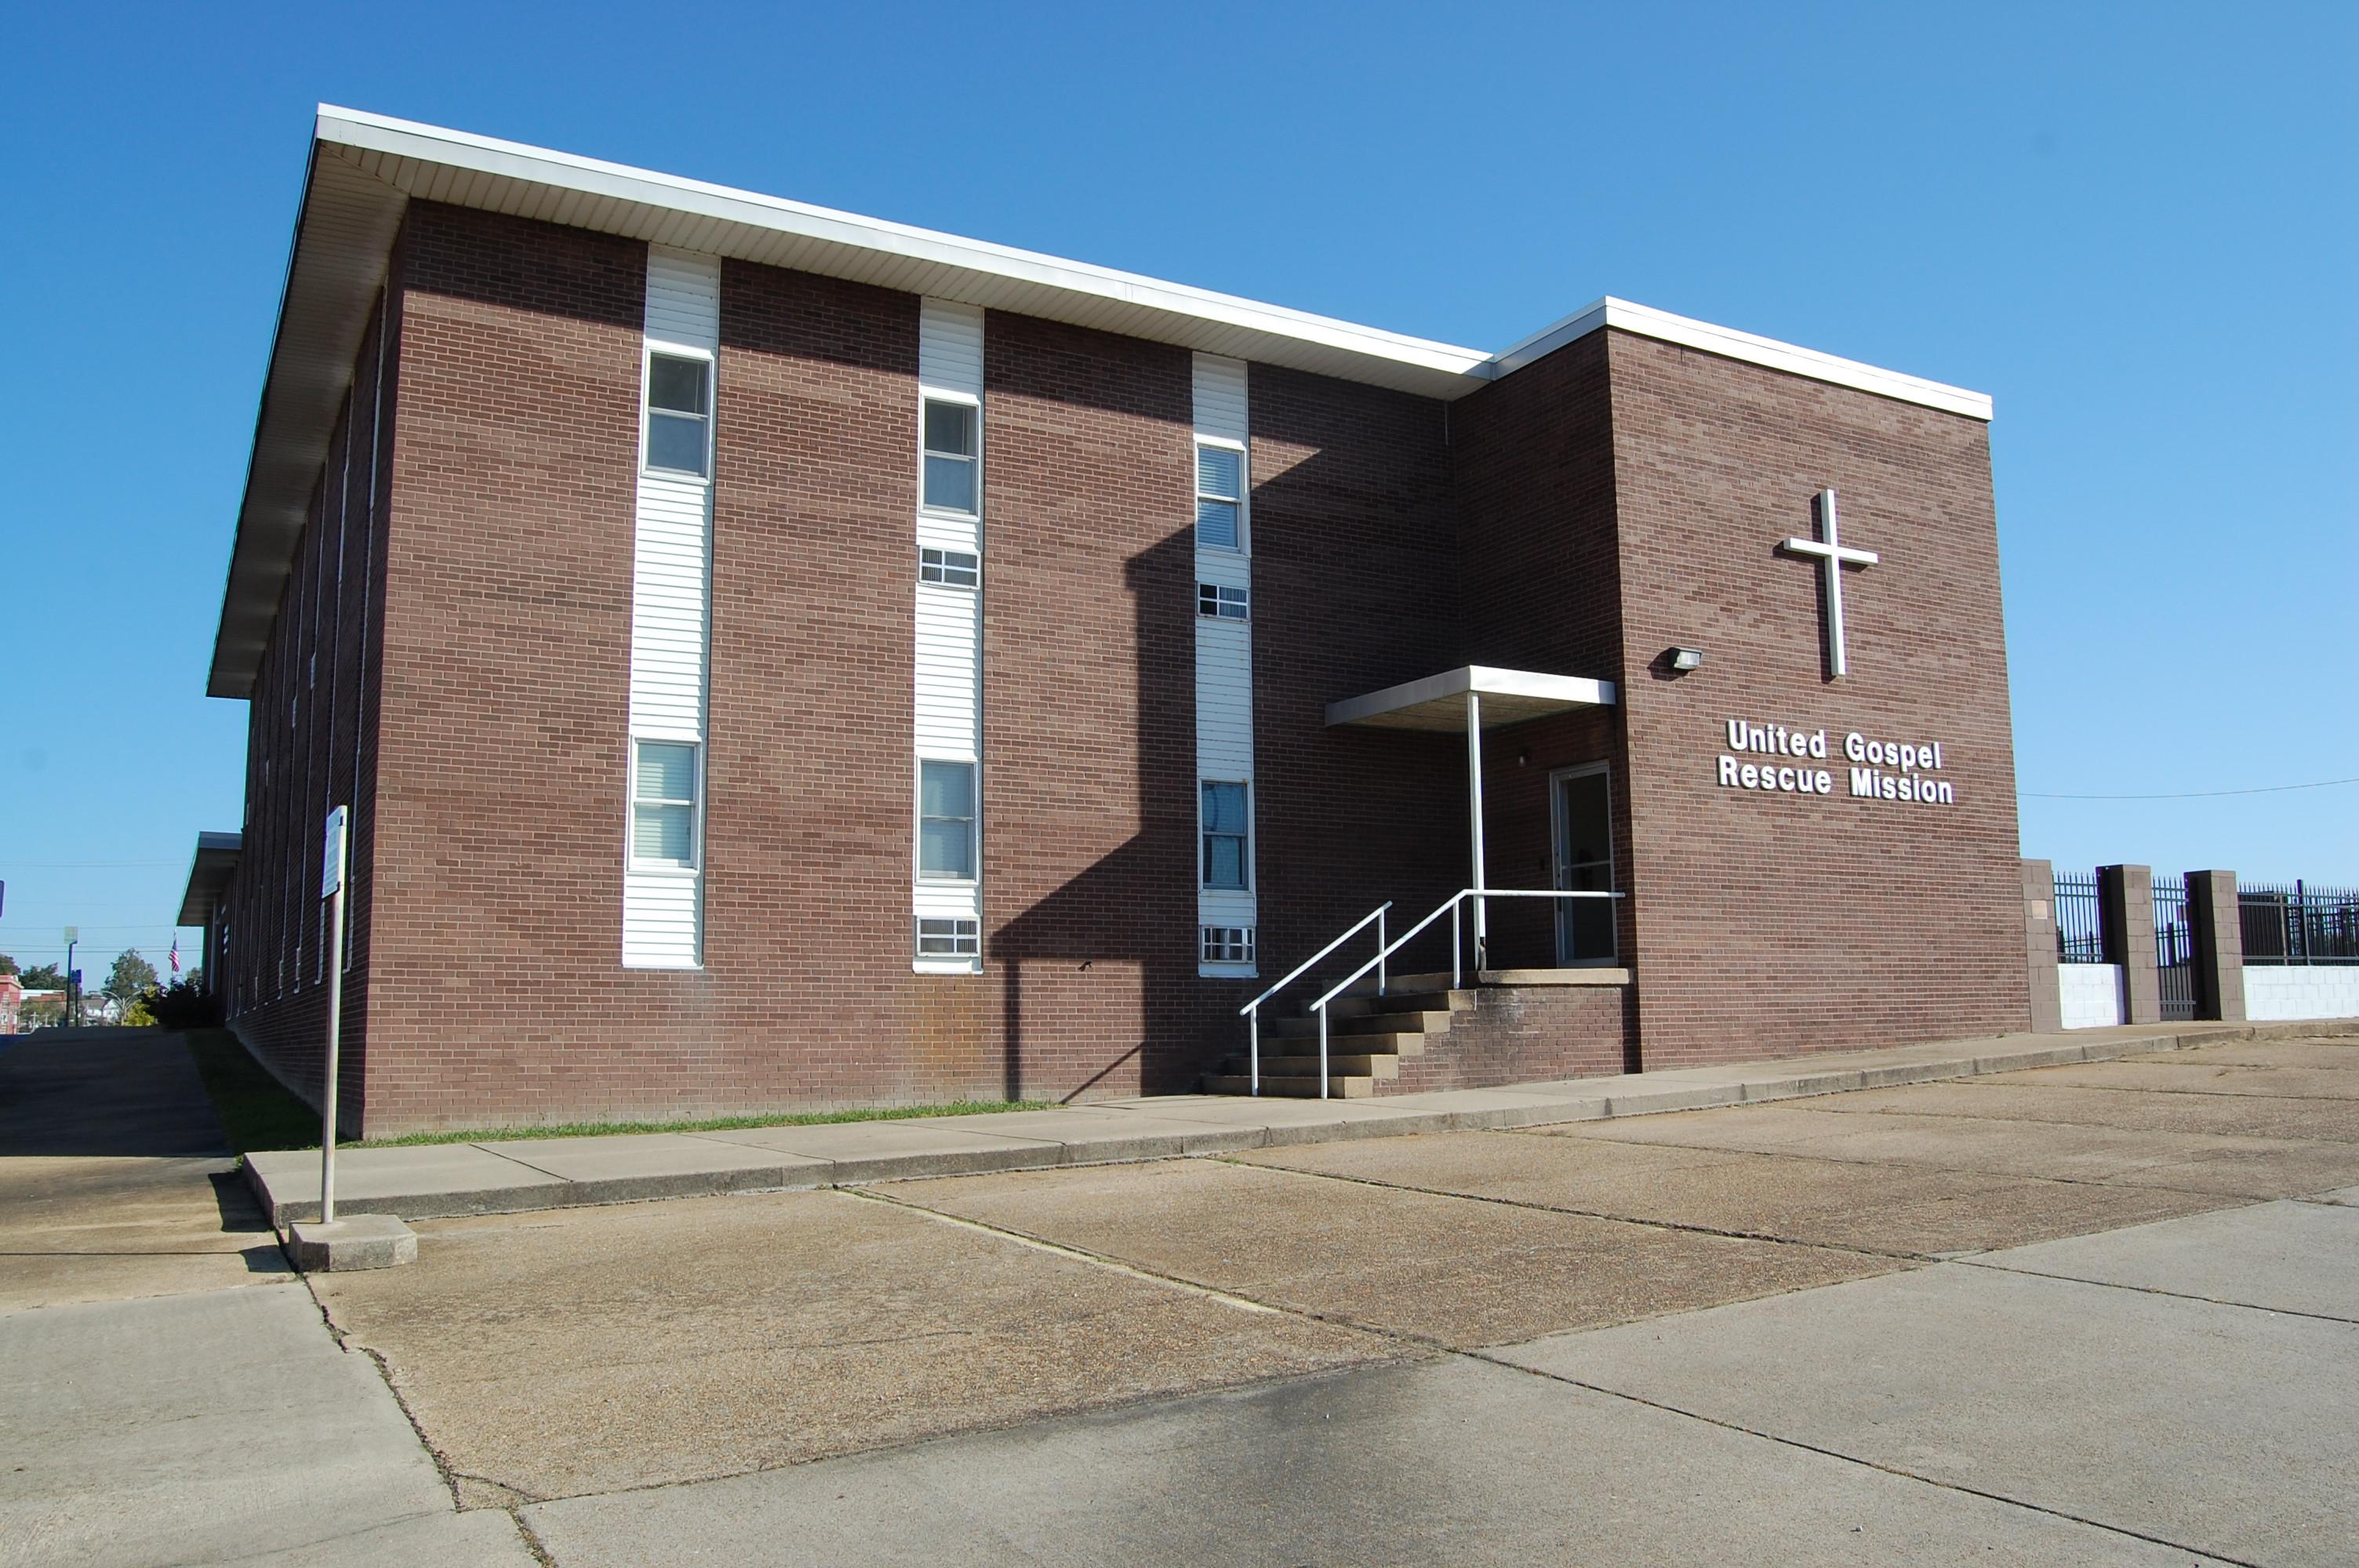 United Gospel Rescue Mission